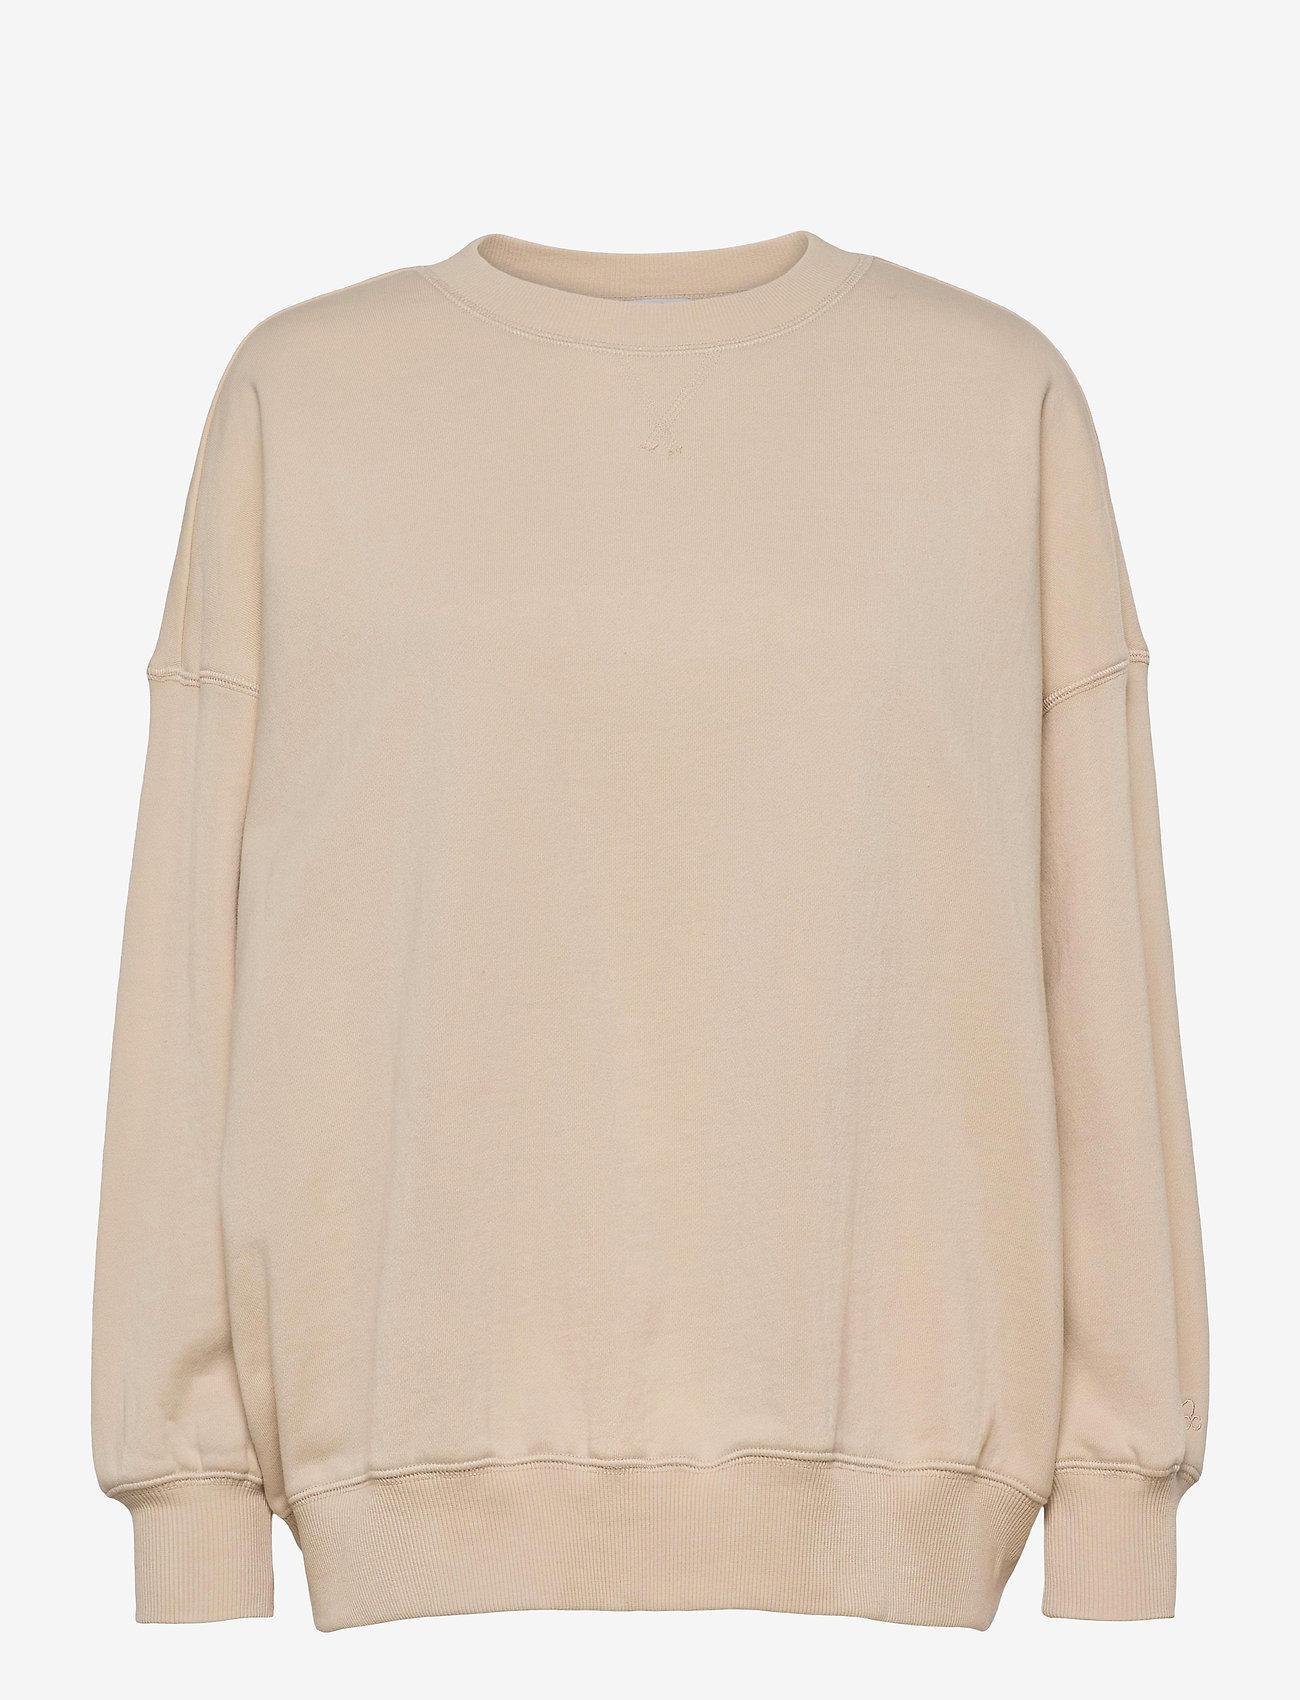 Coster Copenhagen - CC Heart oversize sweatshirt - Orga - sweatshirts & hættetrøjer - vanilla - 0